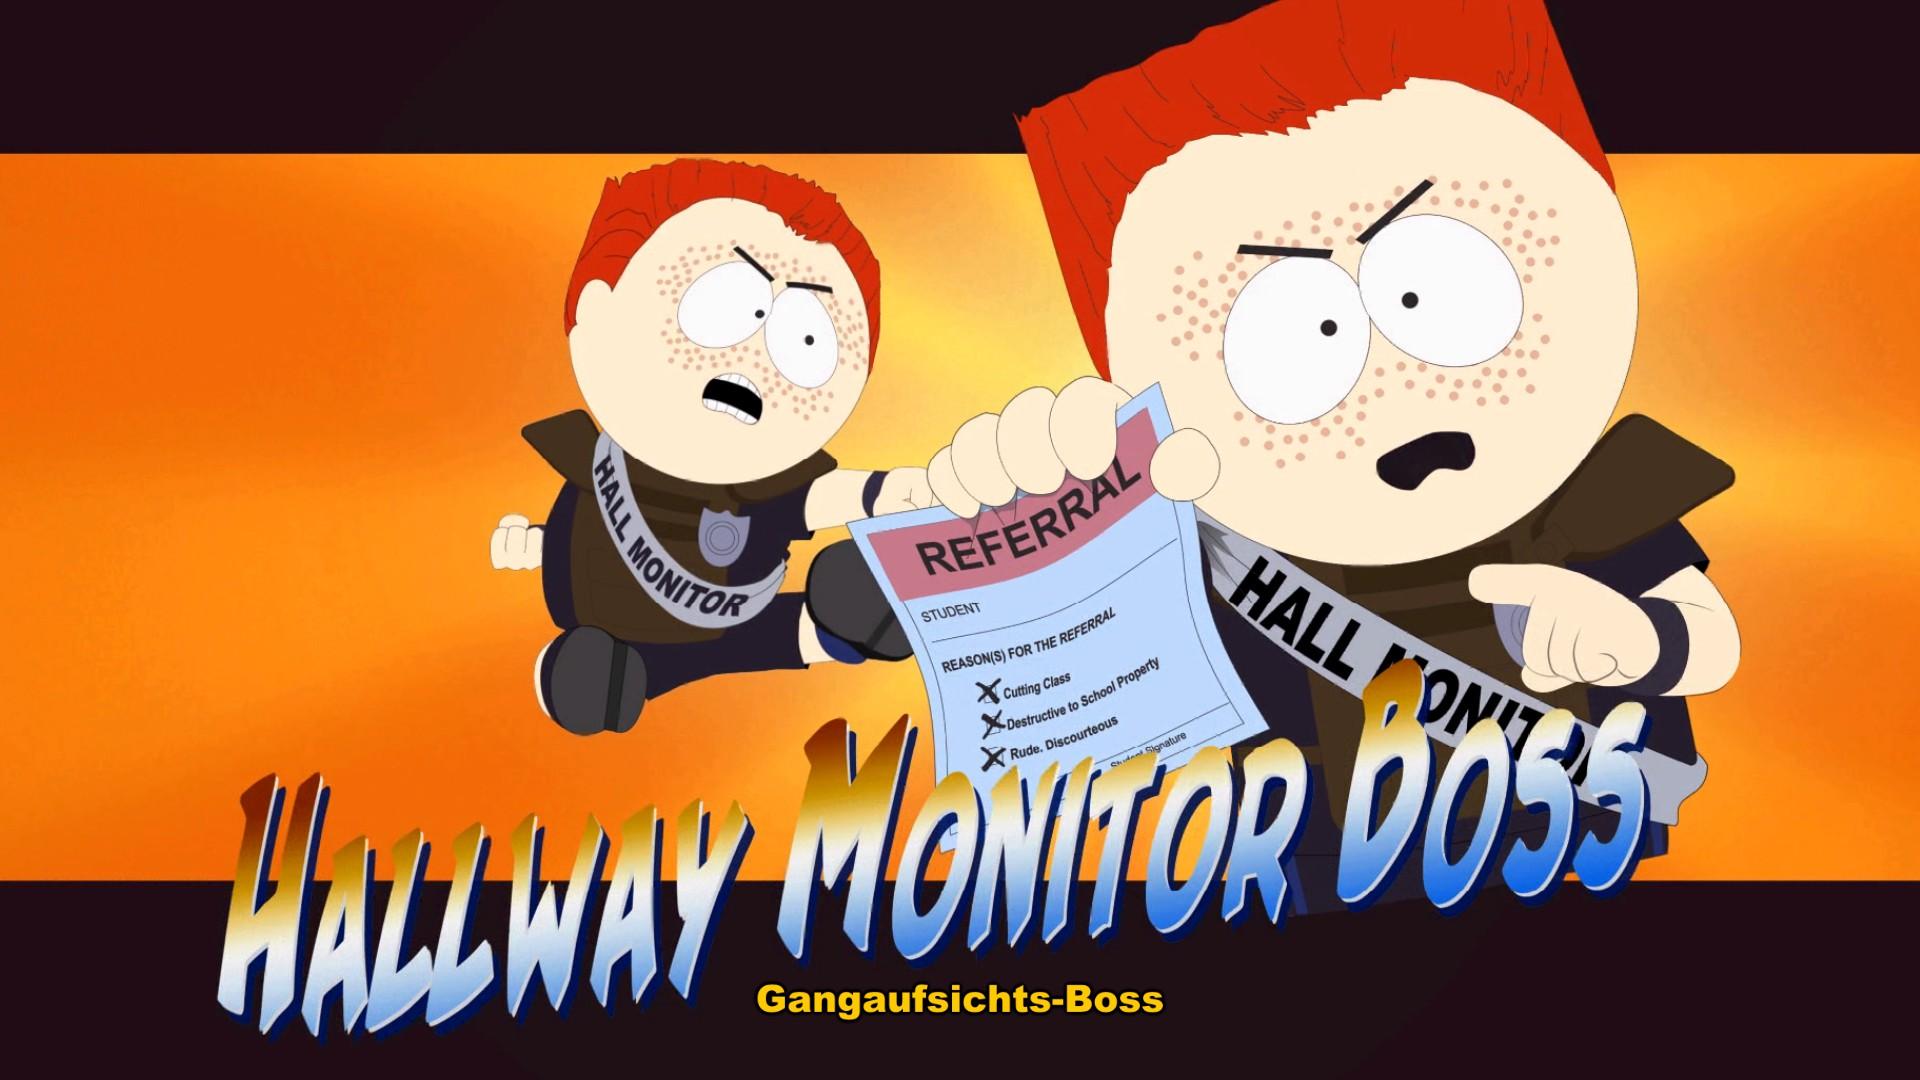 South Park Der Stab der Wahrheit - Gangaufsichts Boss